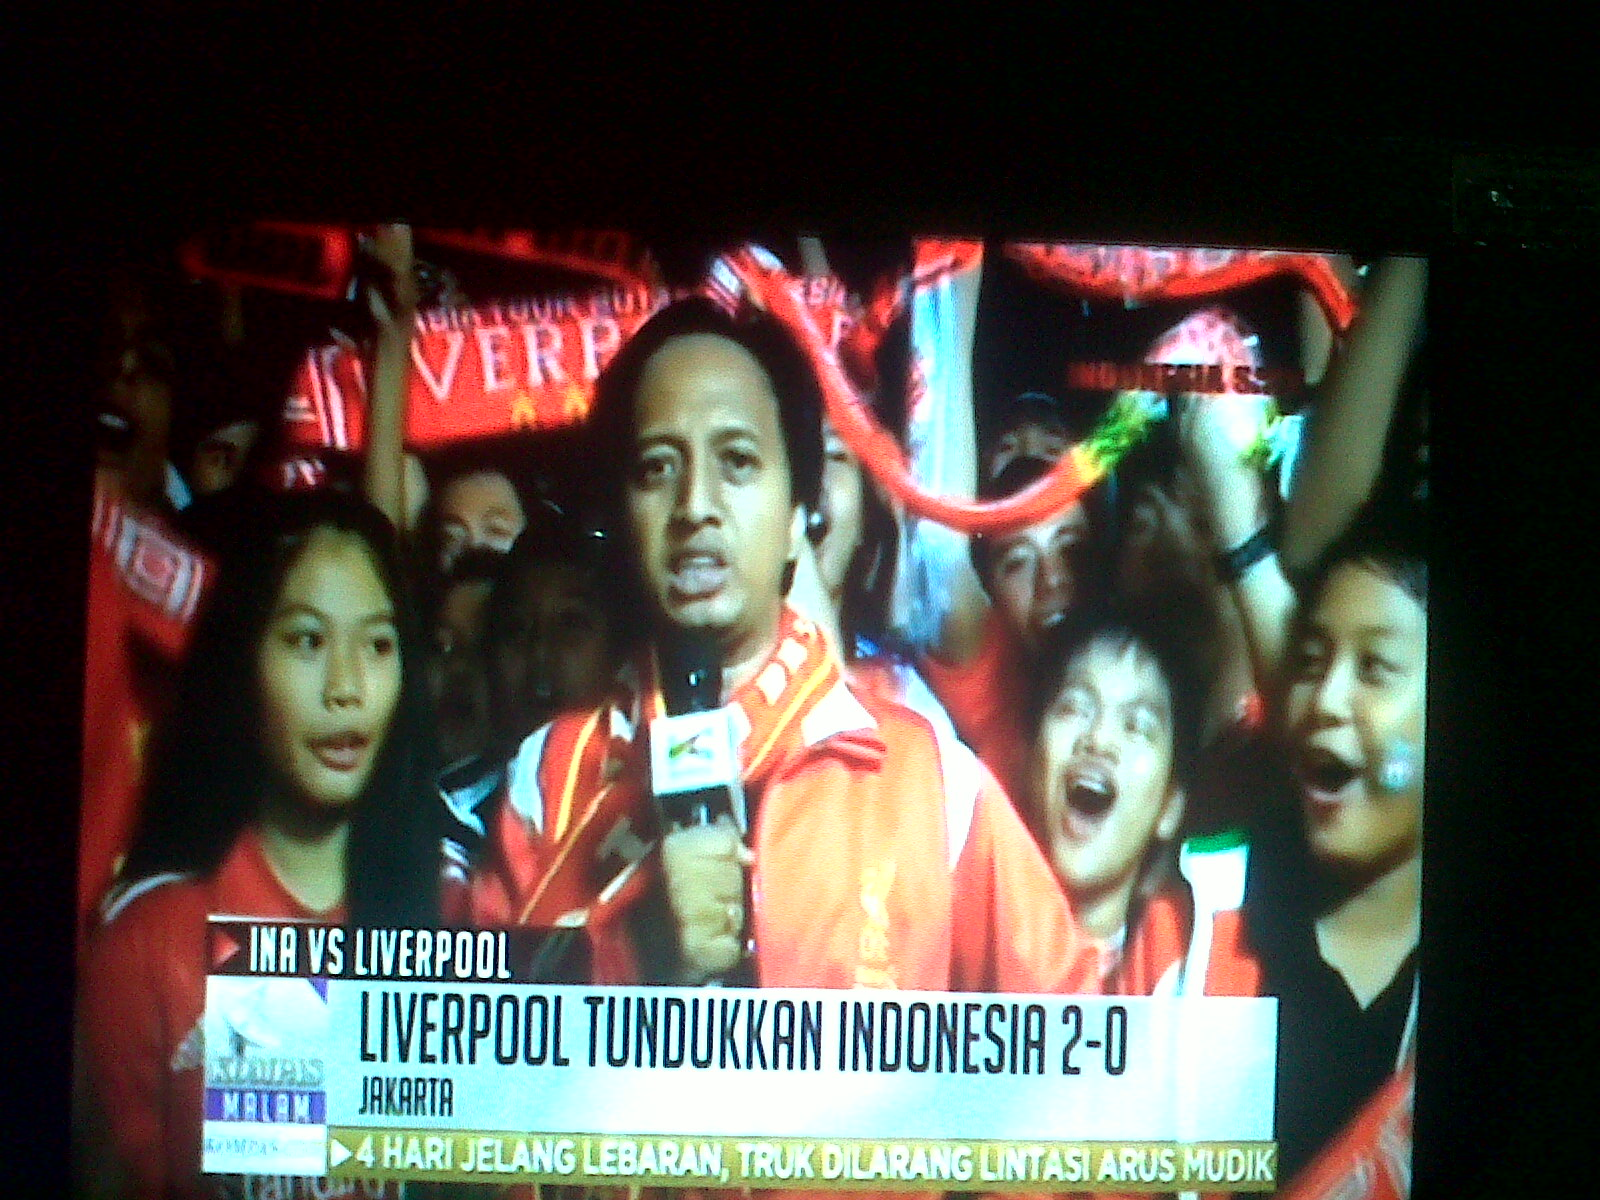 Fist ever Liverpool match at Indonesia. Pertandingan bersejarah.